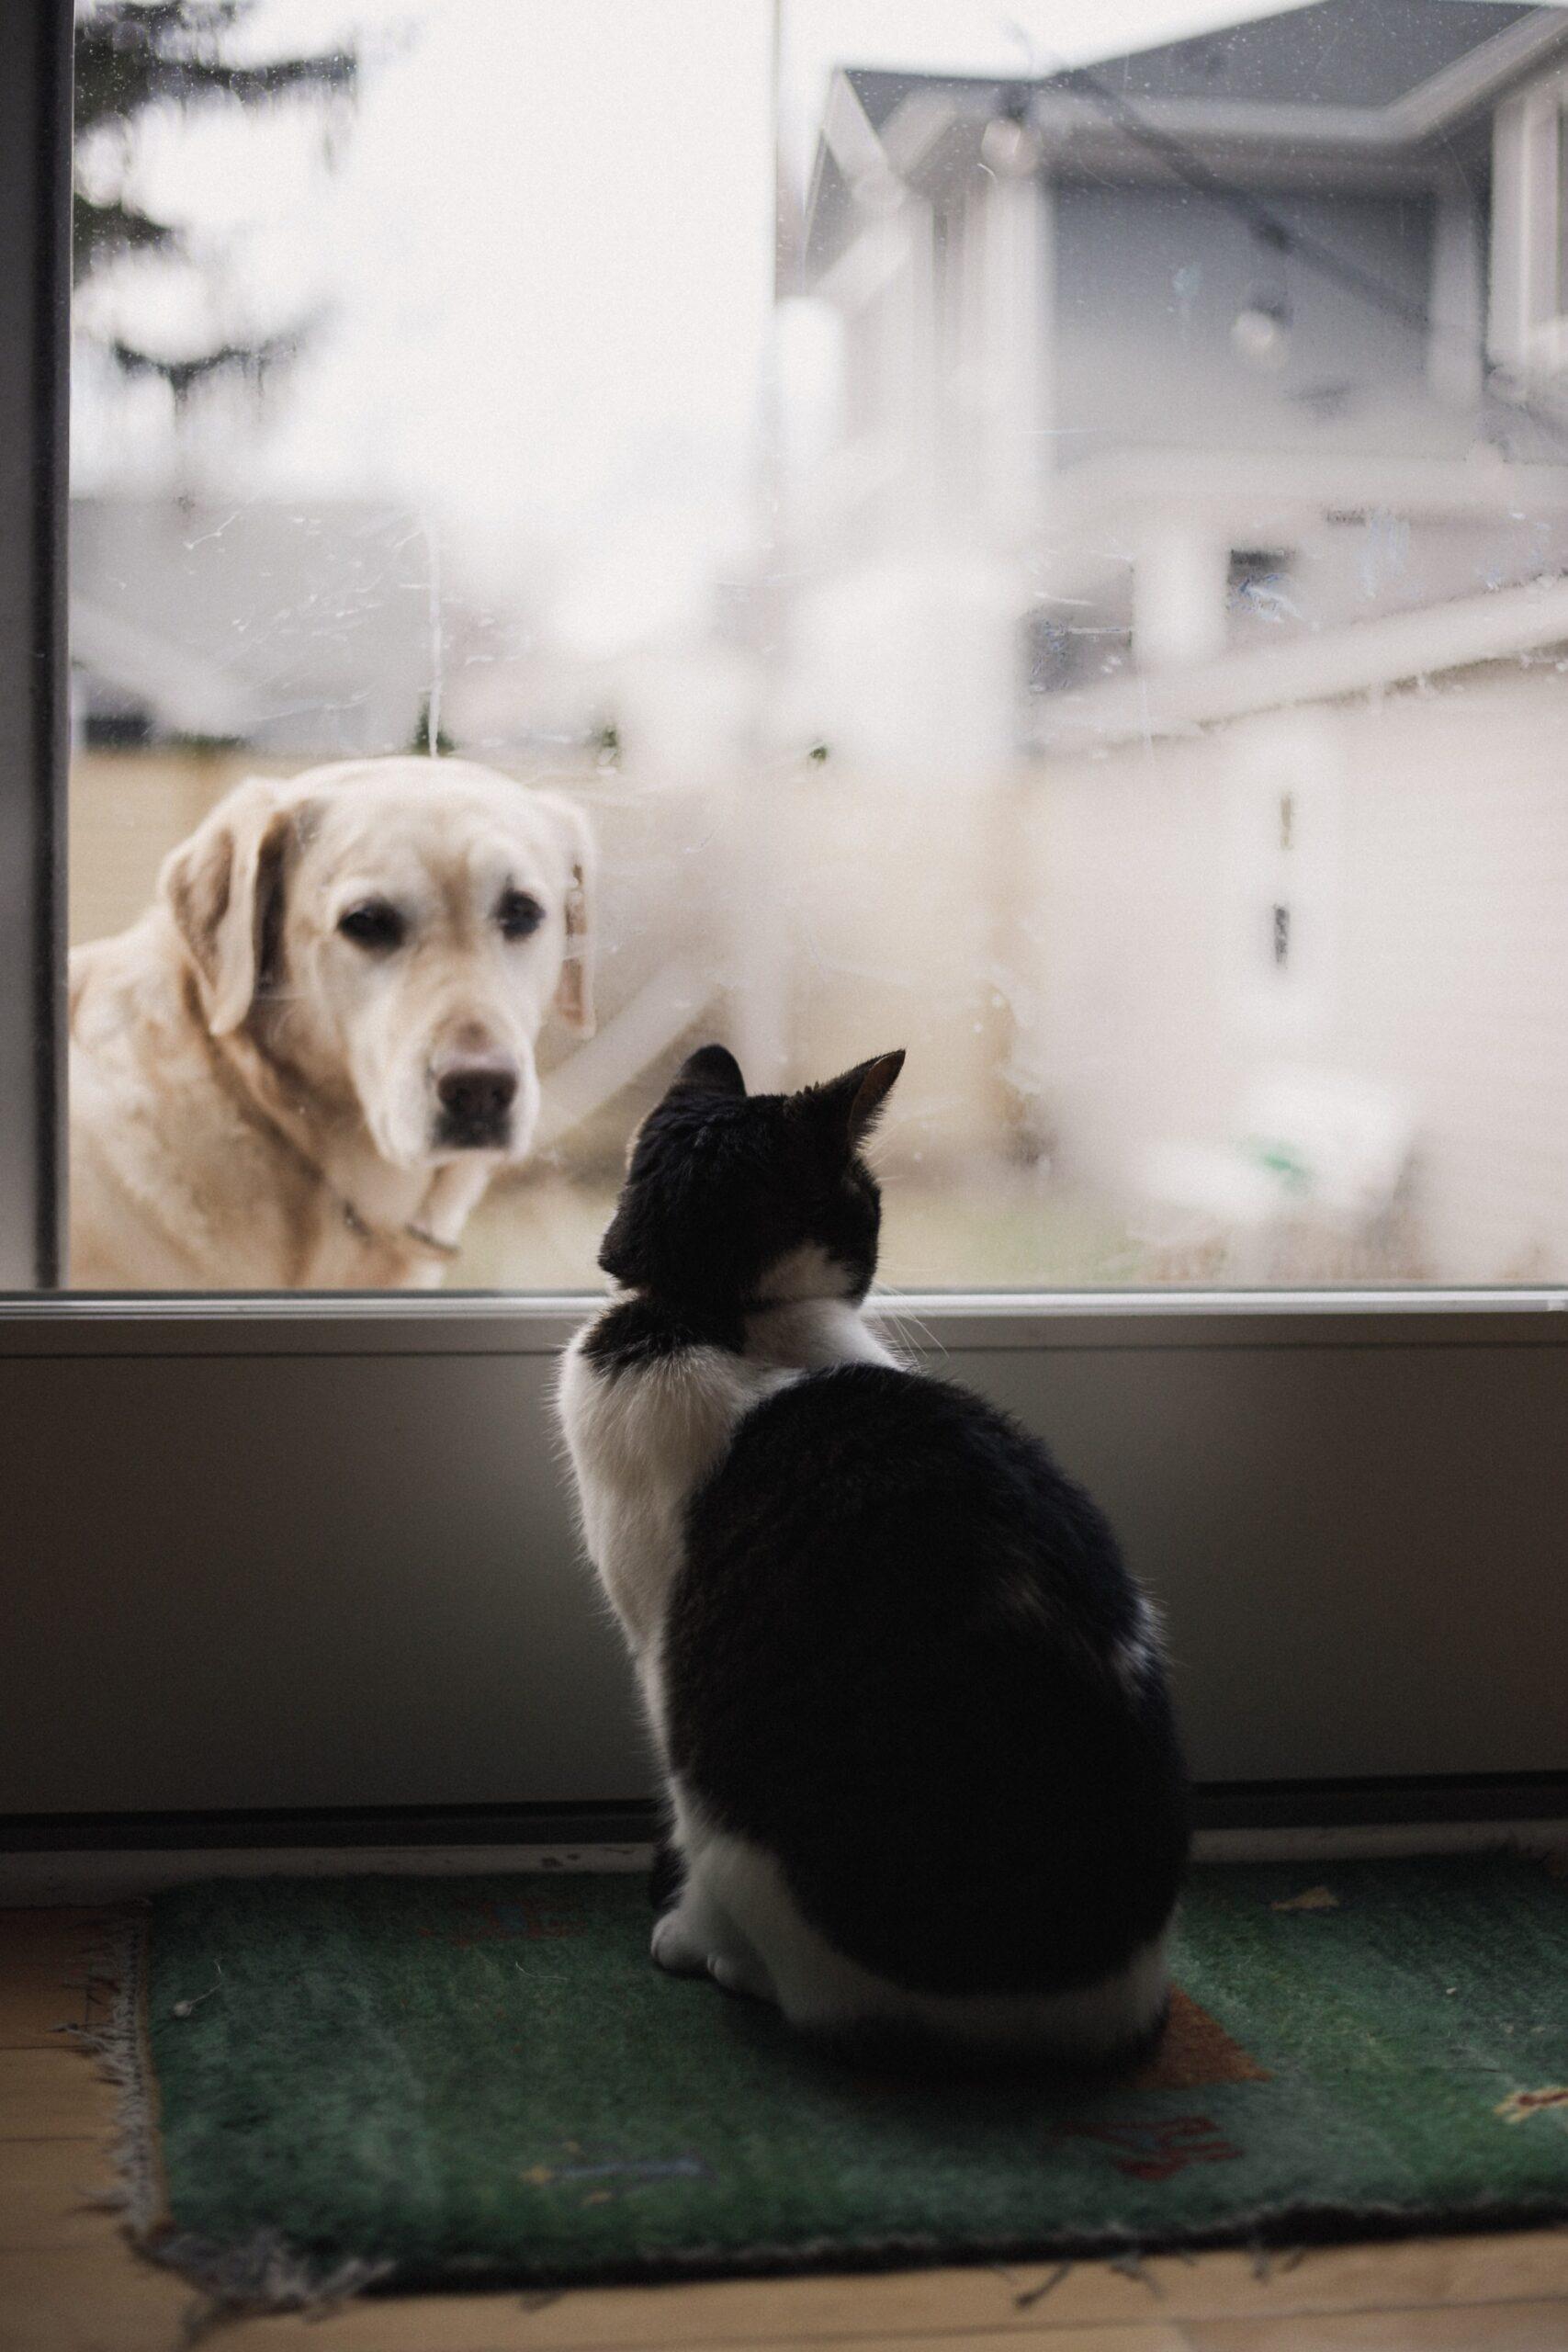 alexis-chloe-Golden R looking through patio window door at black and white cat-unsplash